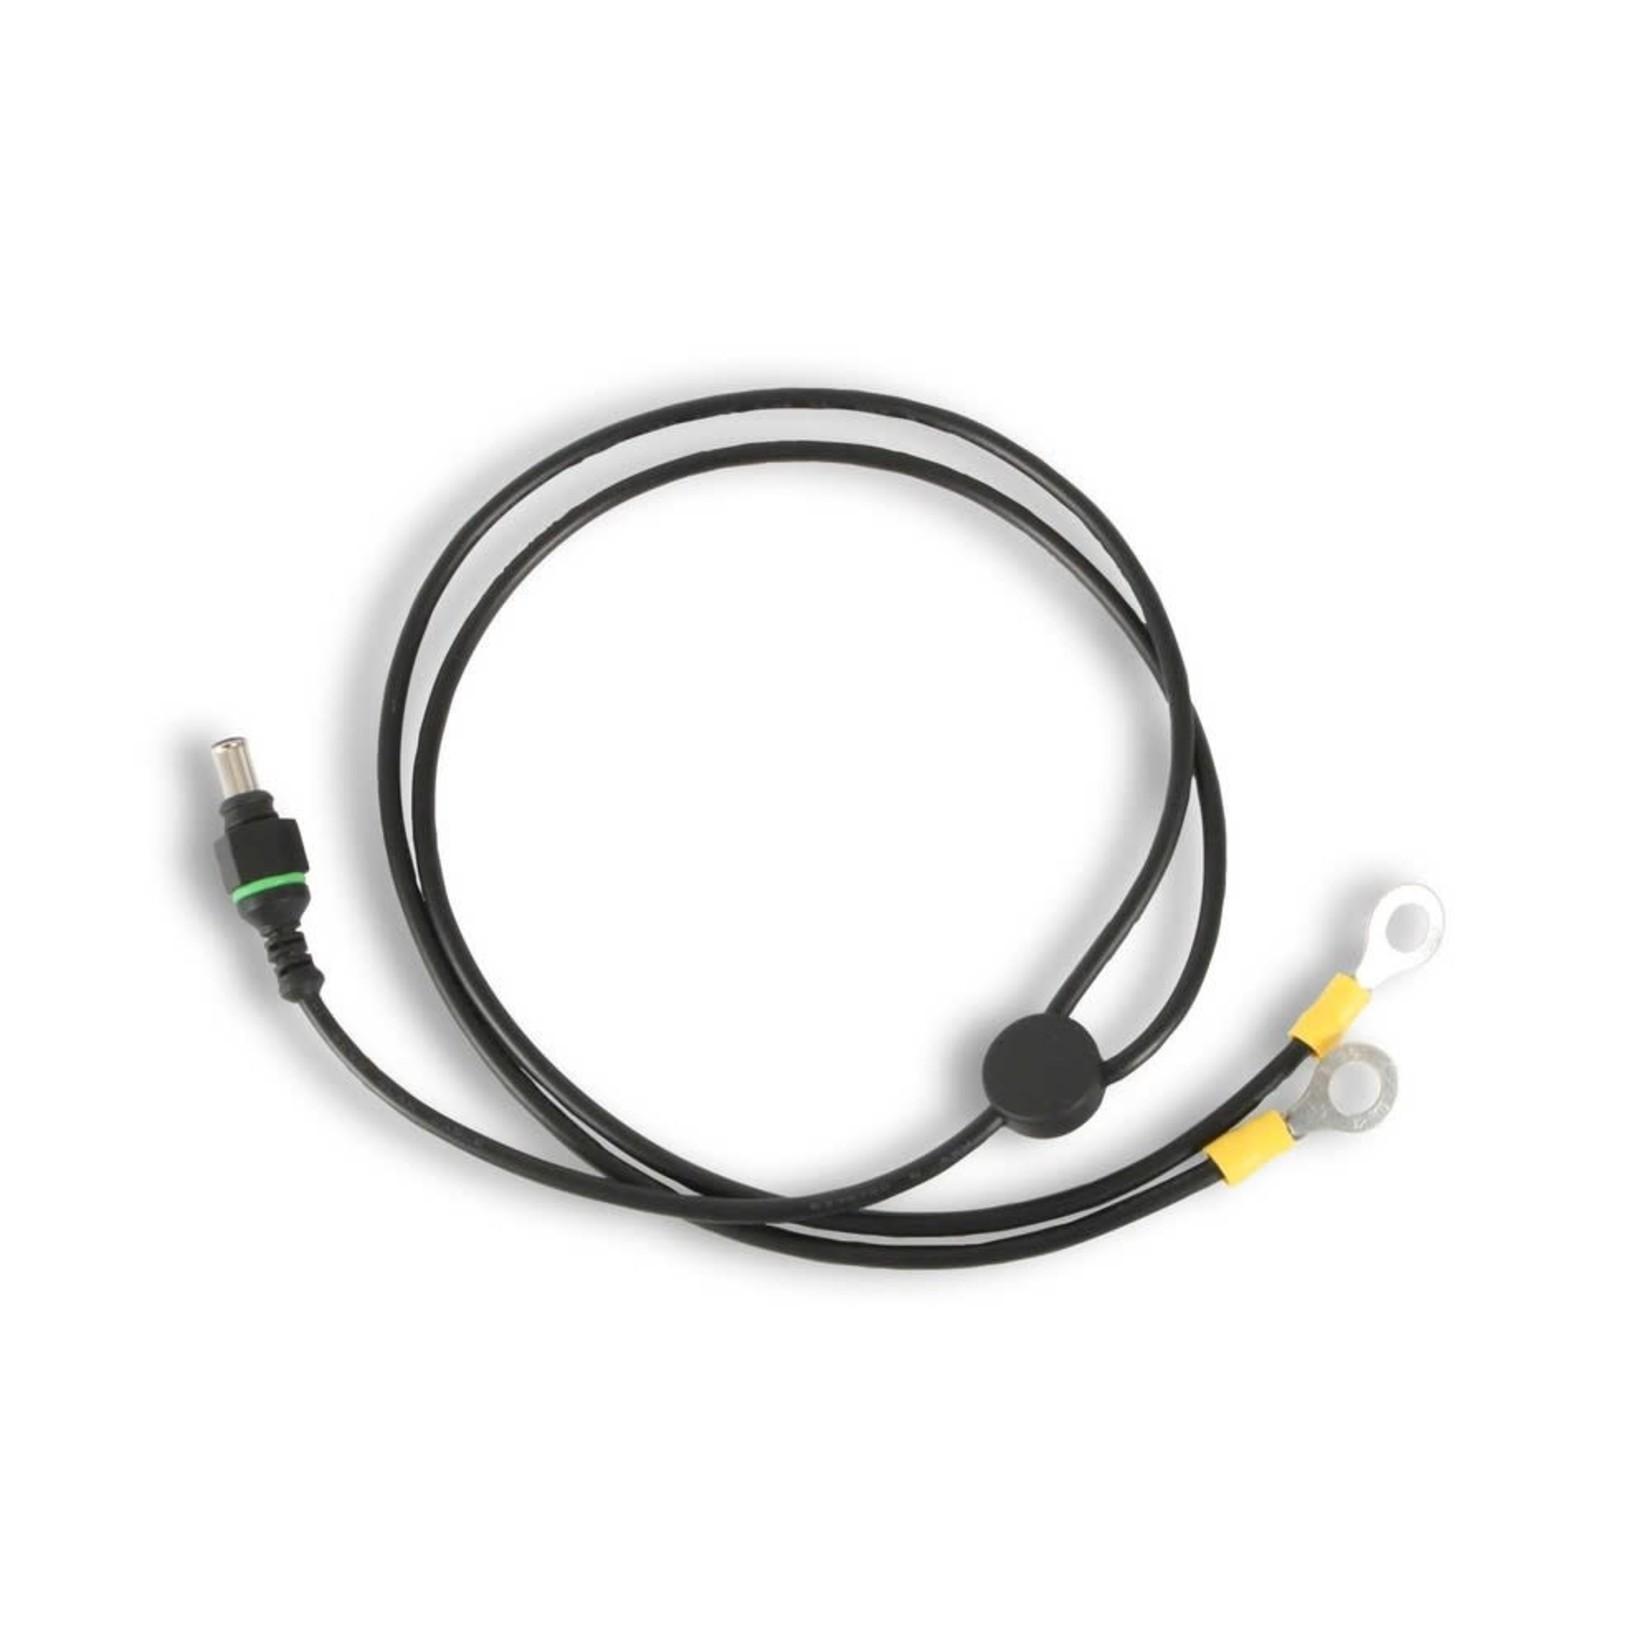 GOALZERO GOAL ZERO 6MM Male to Ring Terminal Adapter